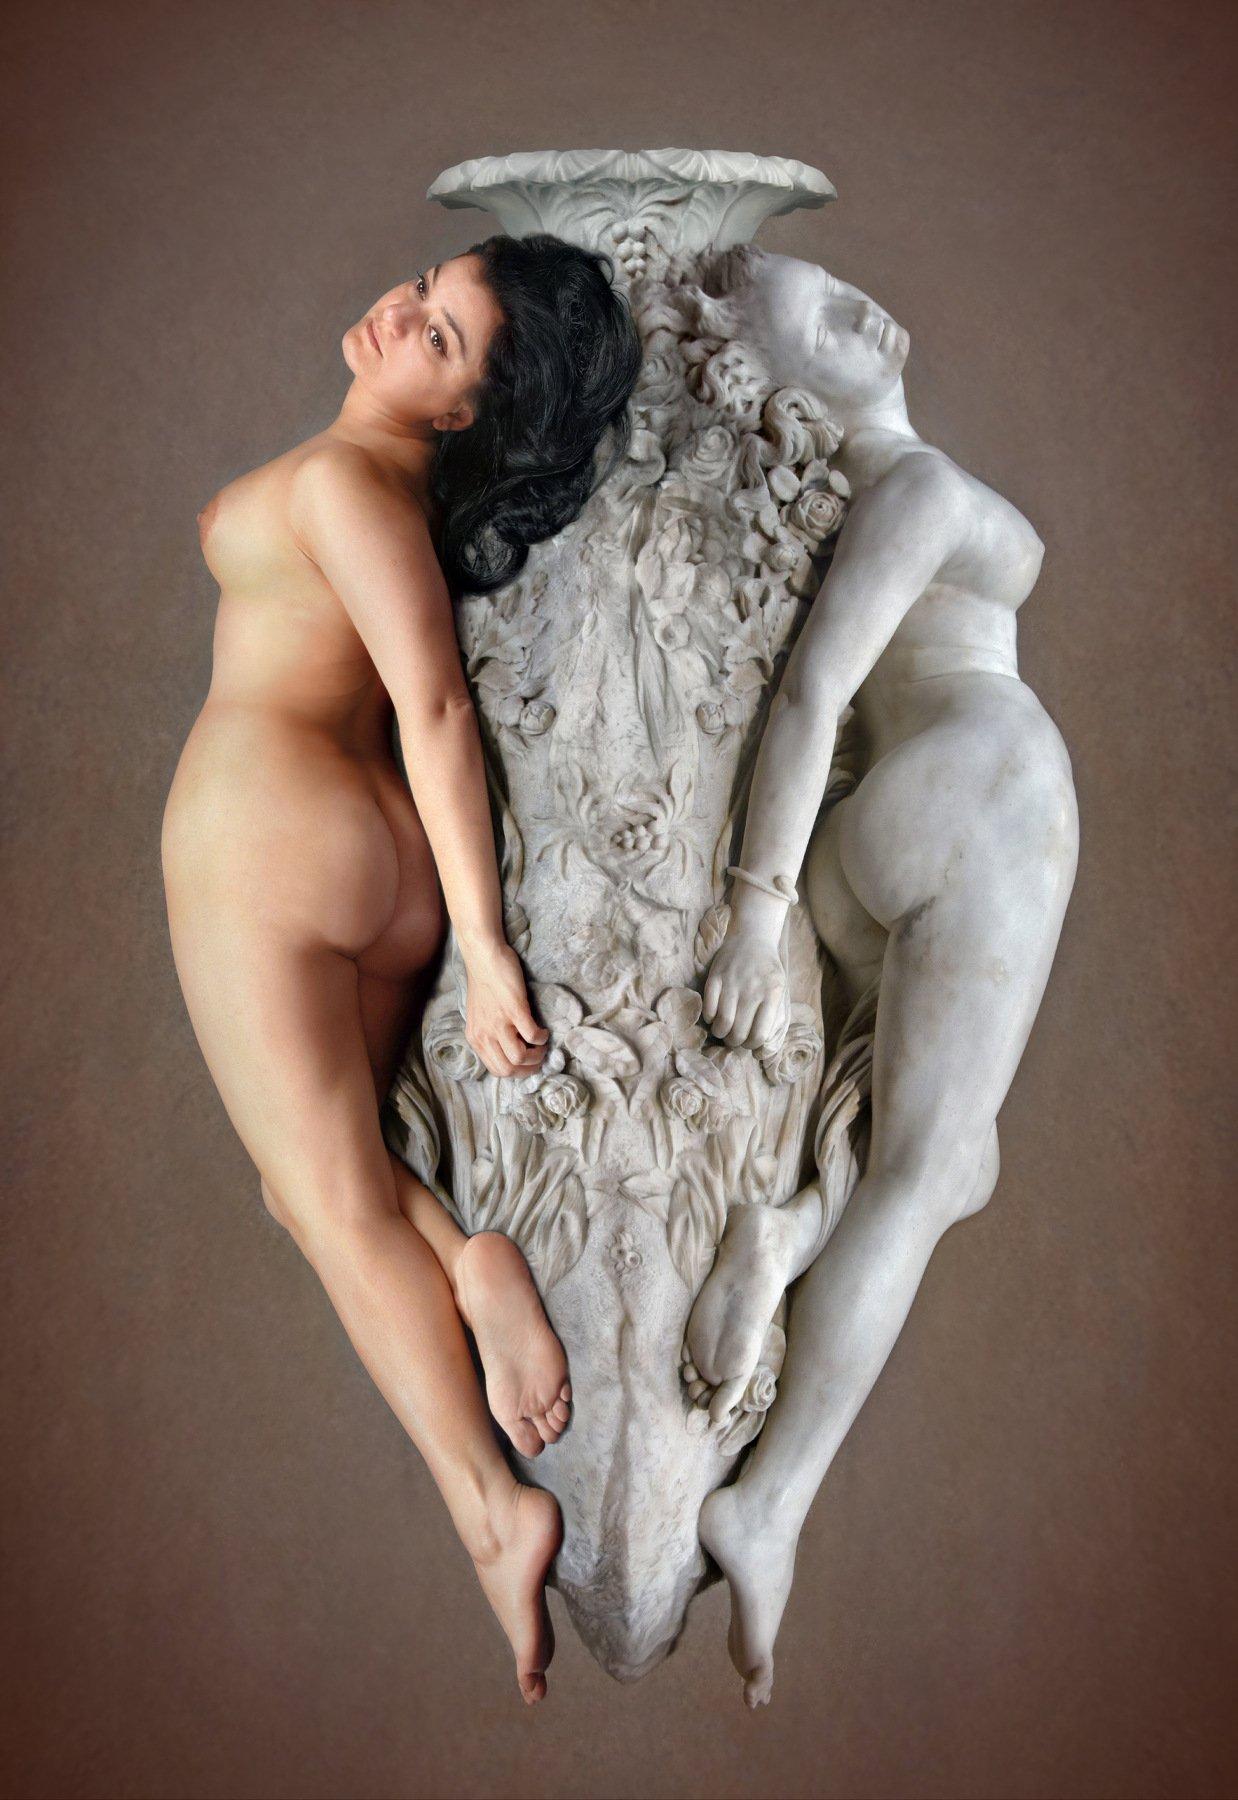 marble, stone, sculpture, art, museum, model, posing, nude, collage, orsay, paris, live, statue, Endegor